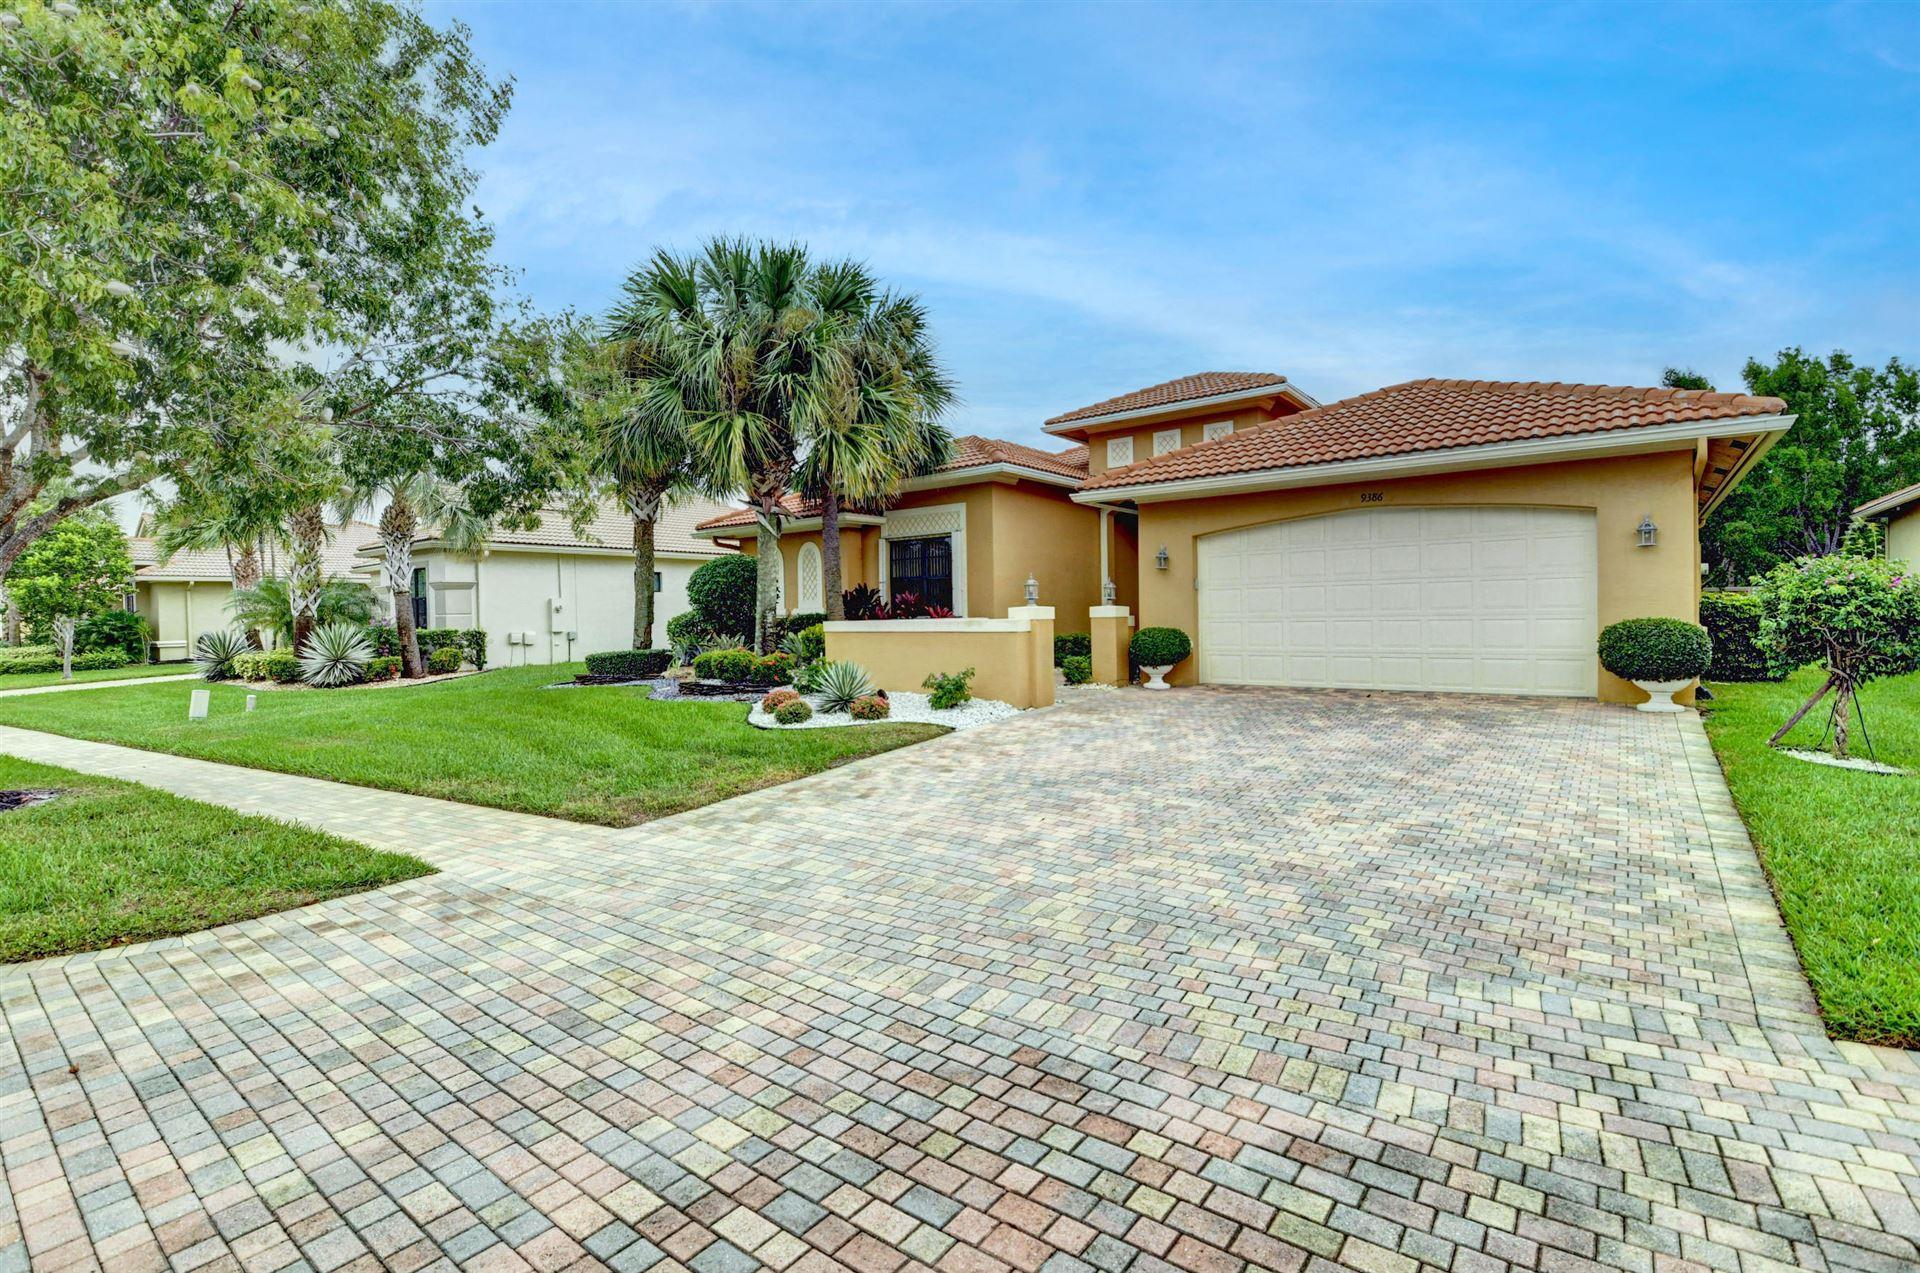 Photo of 9386 Isles Cay Drive, Delray Beach, FL 33446 (MLS # RX-10674960)